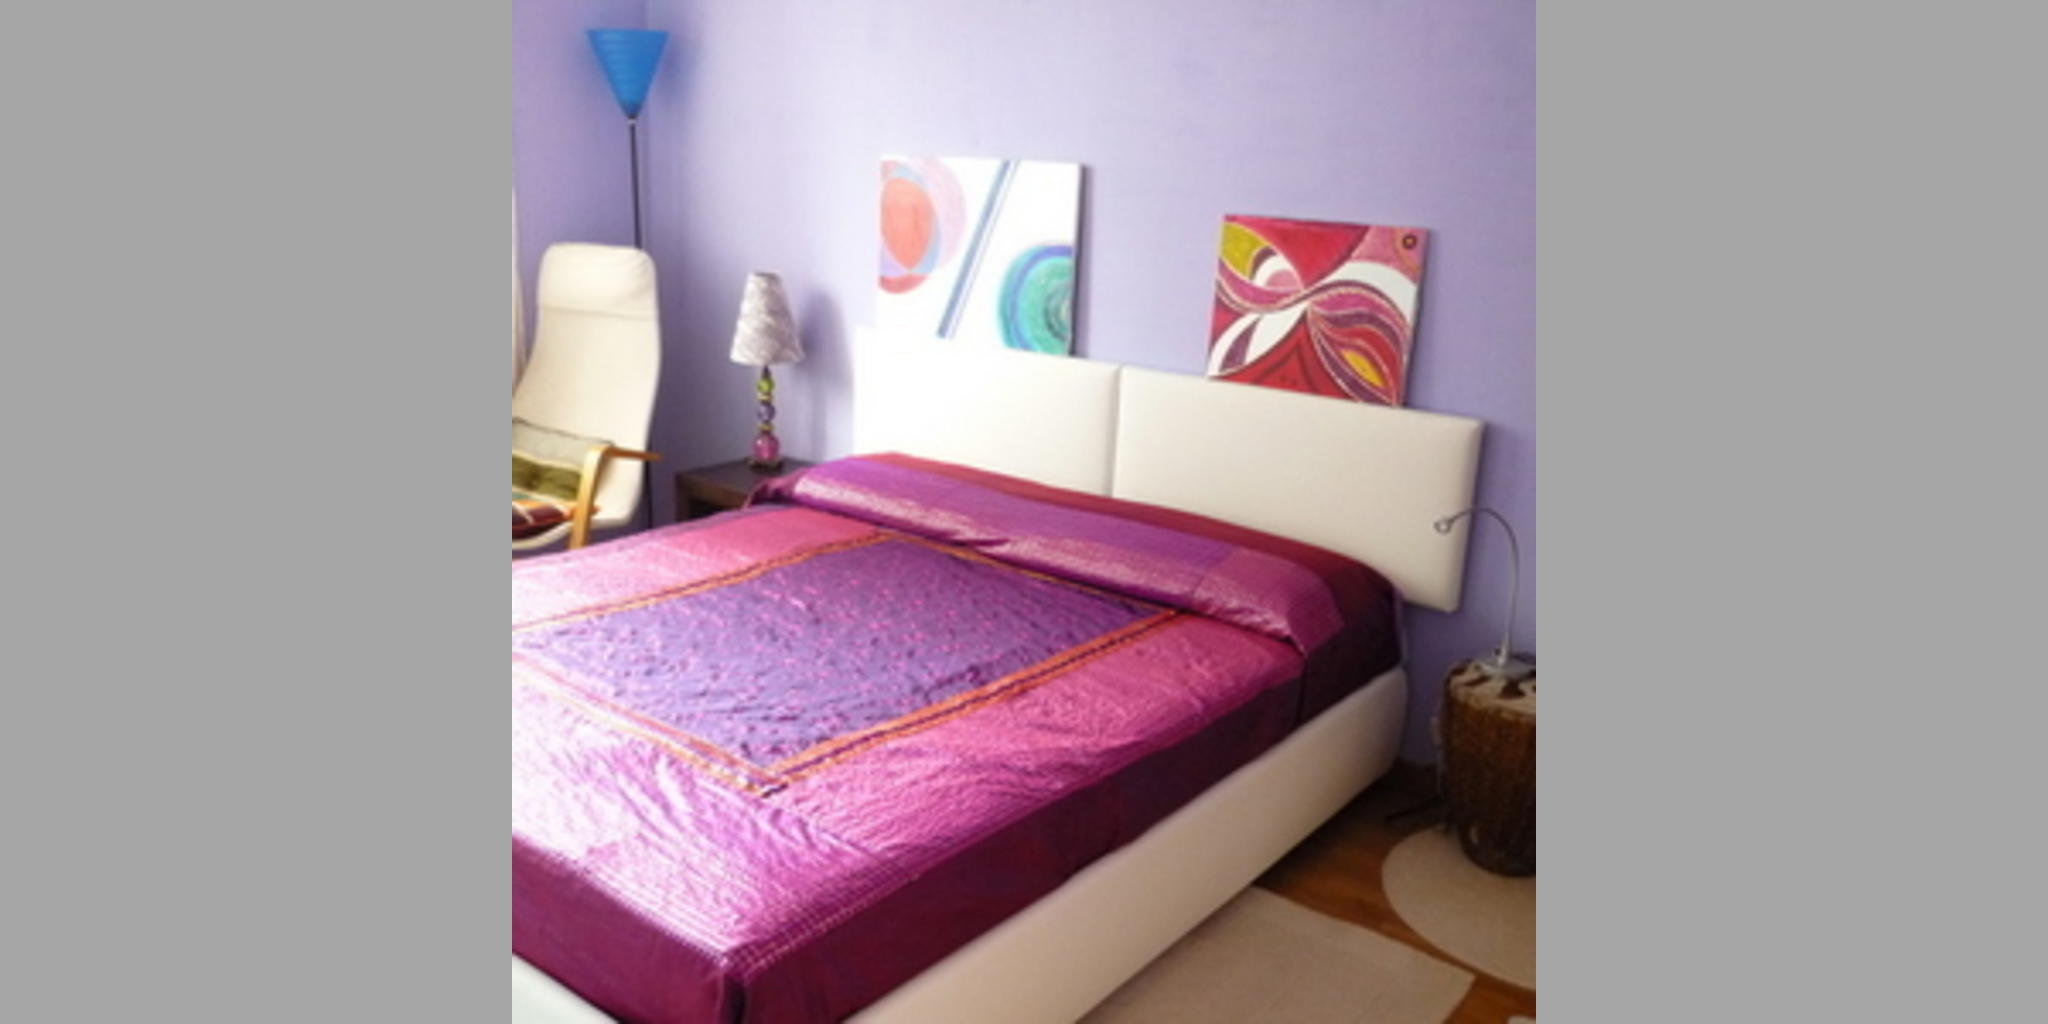 Bed & Breakfast Roma - Casalpalocco_Acusilao